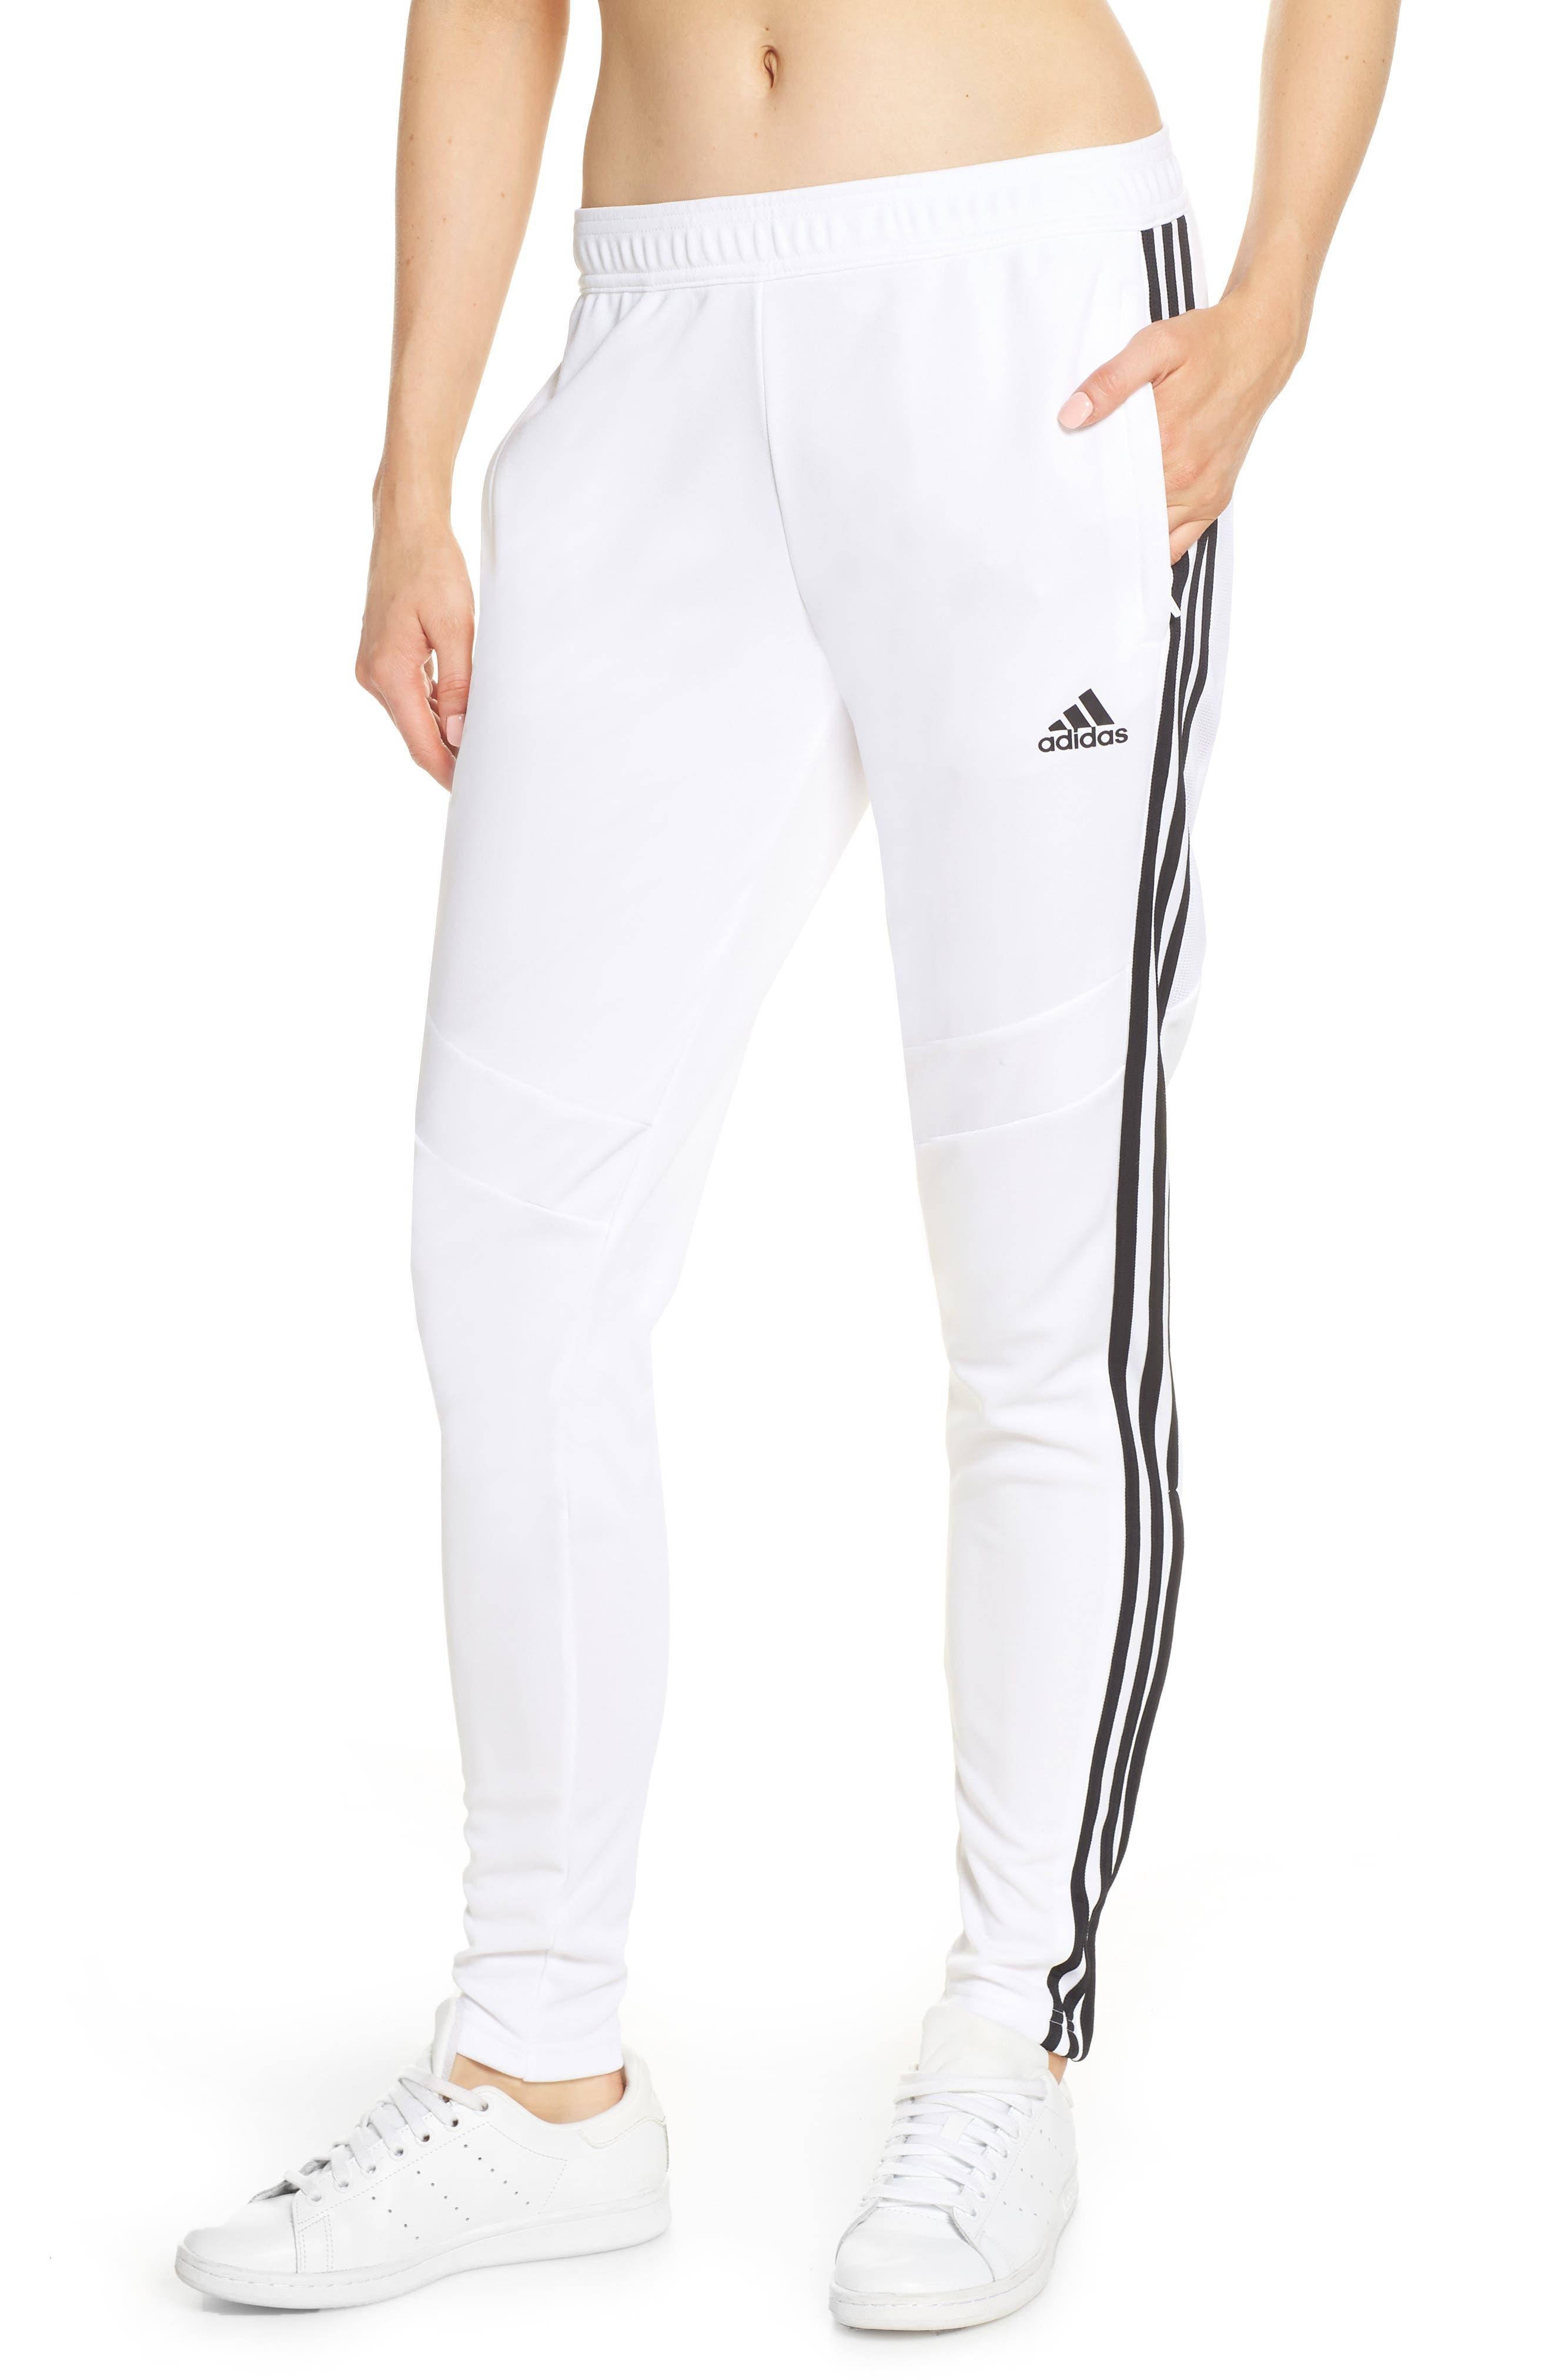 ADIDAS Tiro 19 Training Pants, Main, color, WHITE/ BLACK